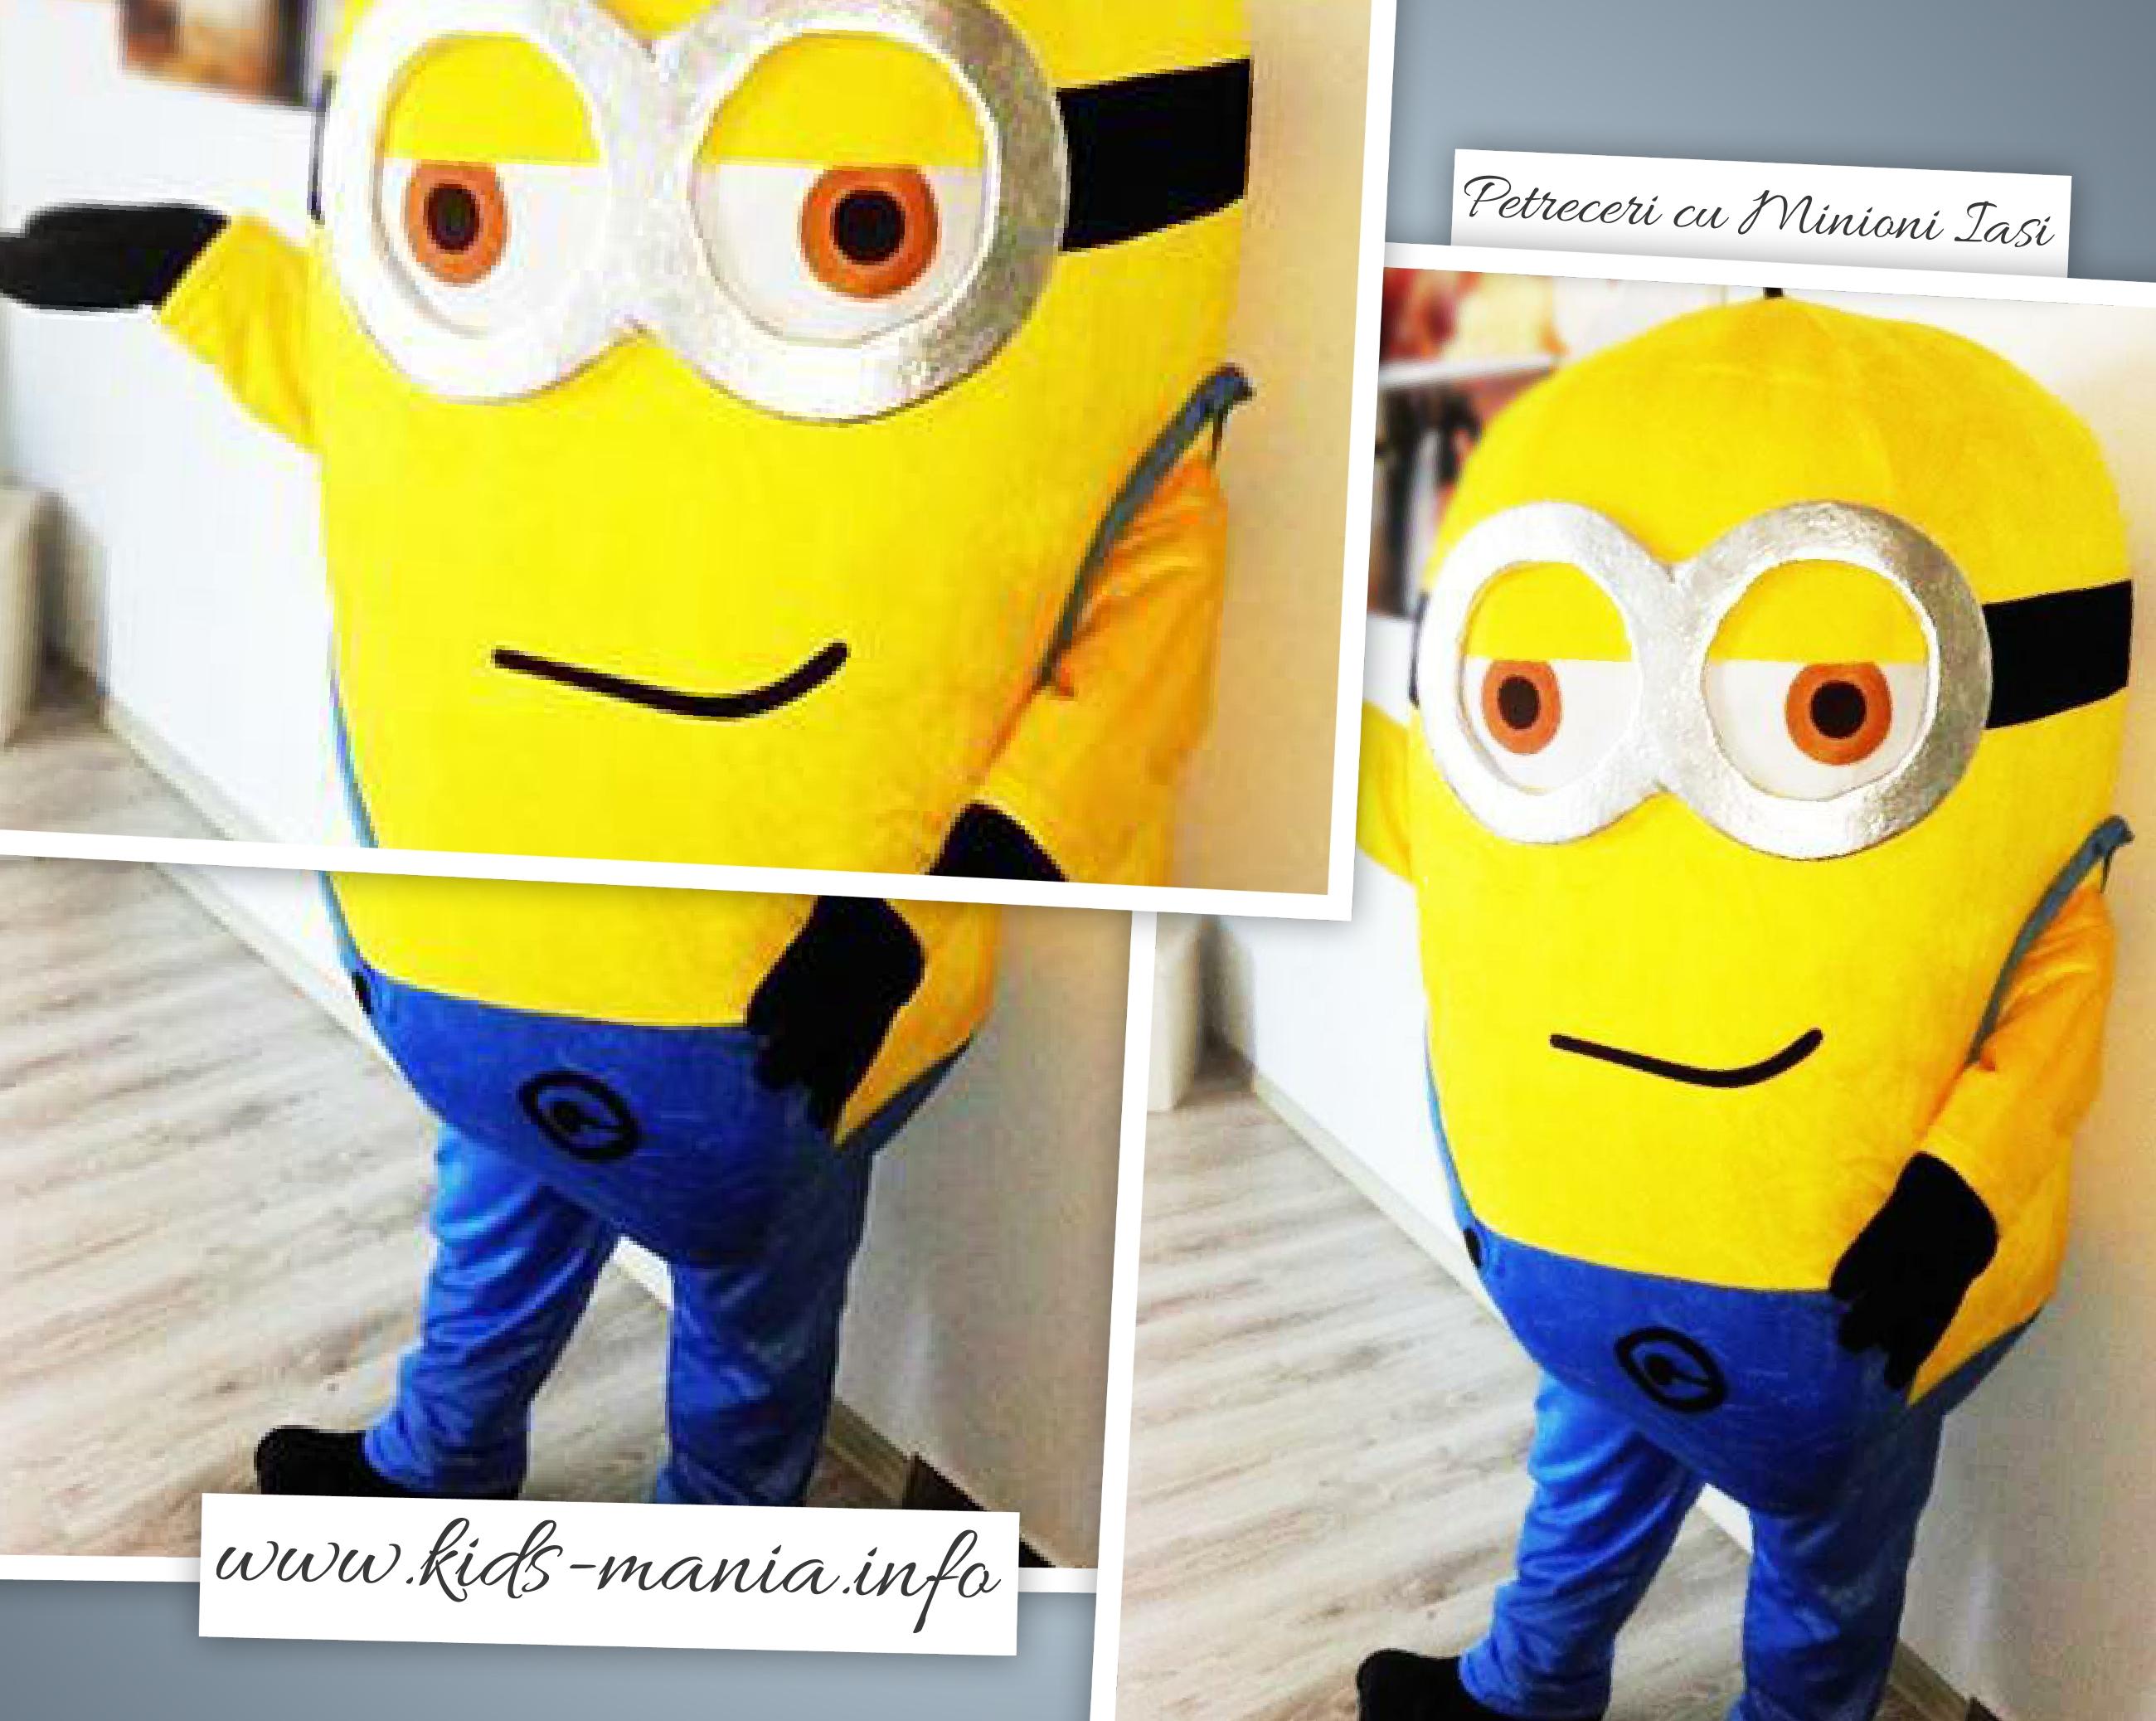 Minionii - mascote animatori la petreceri pentru copii